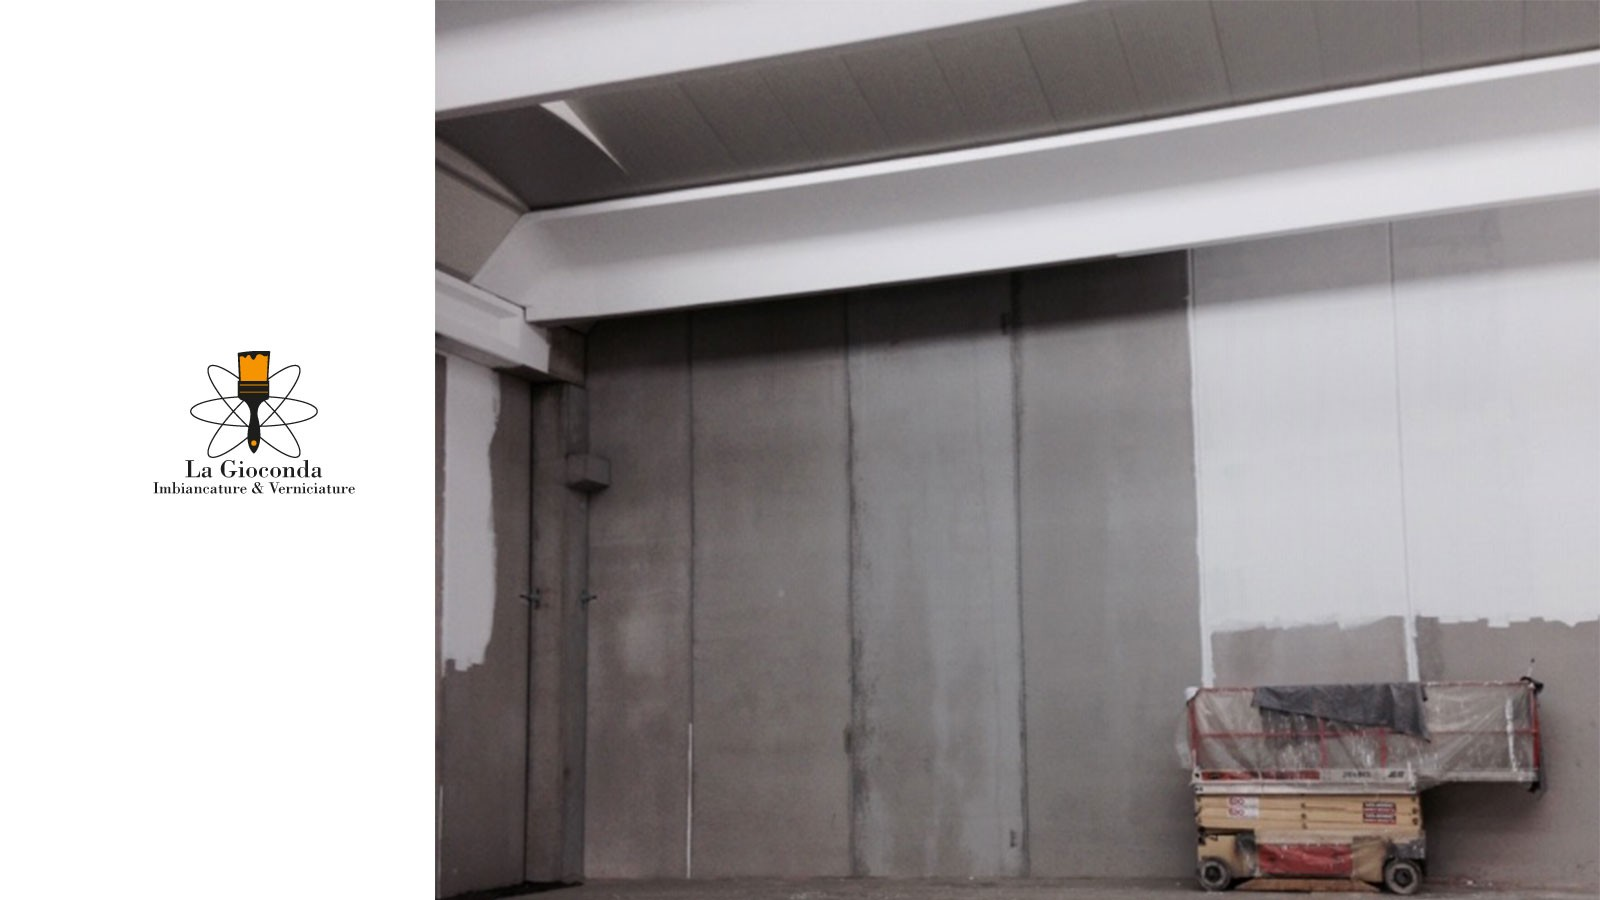 La Gioconda Imbiancature & Verniciature di De Sena Carmine56